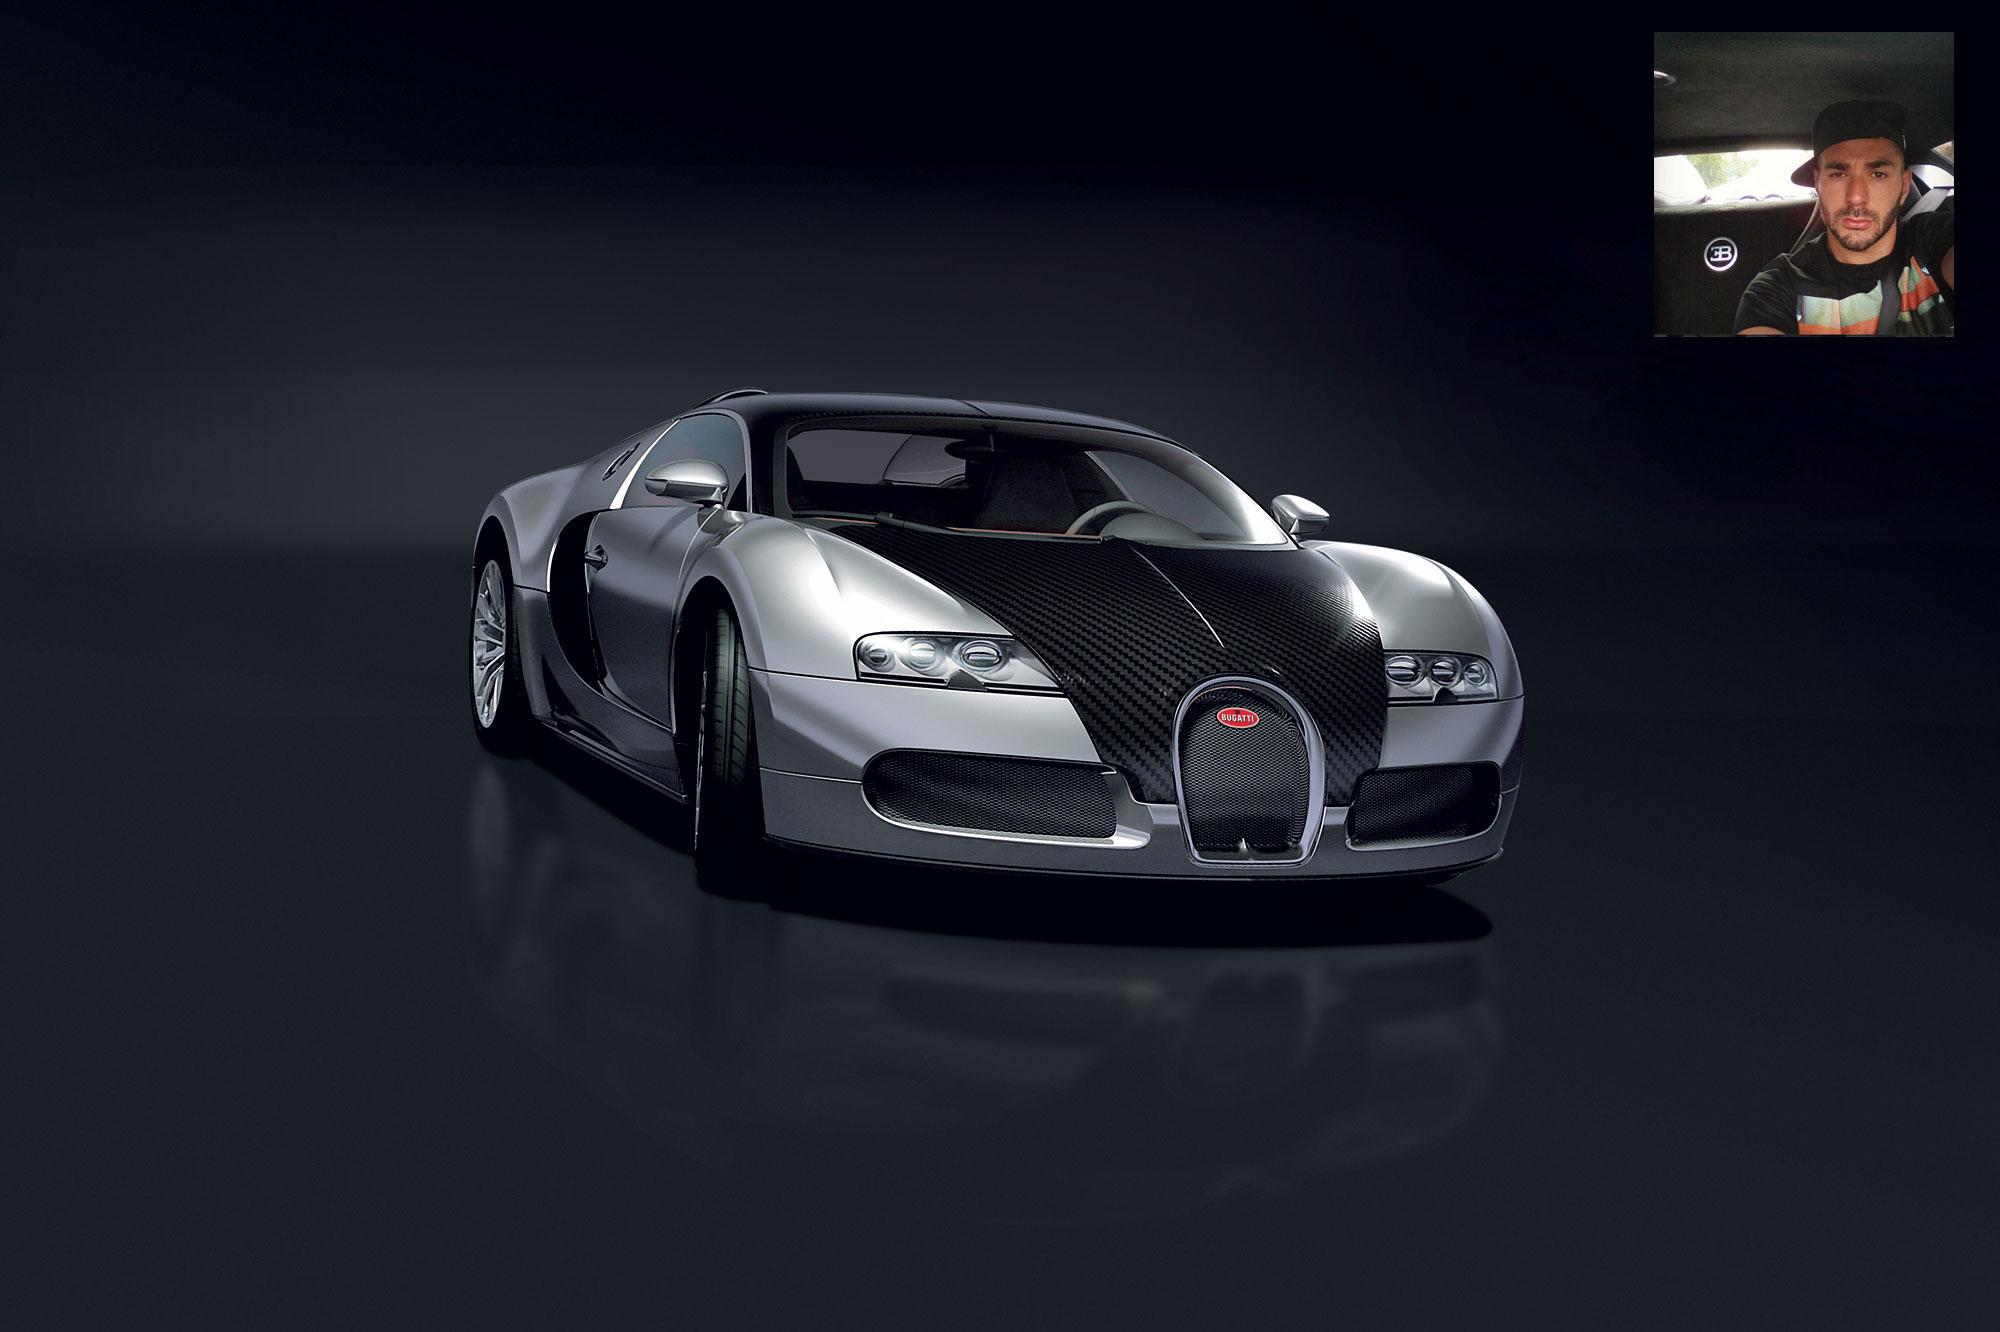 bugatti veyron a benzema bugatti veyron de benzema youtube d couvrez la bugatti veyron de. Black Bedroom Furniture Sets. Home Design Ideas